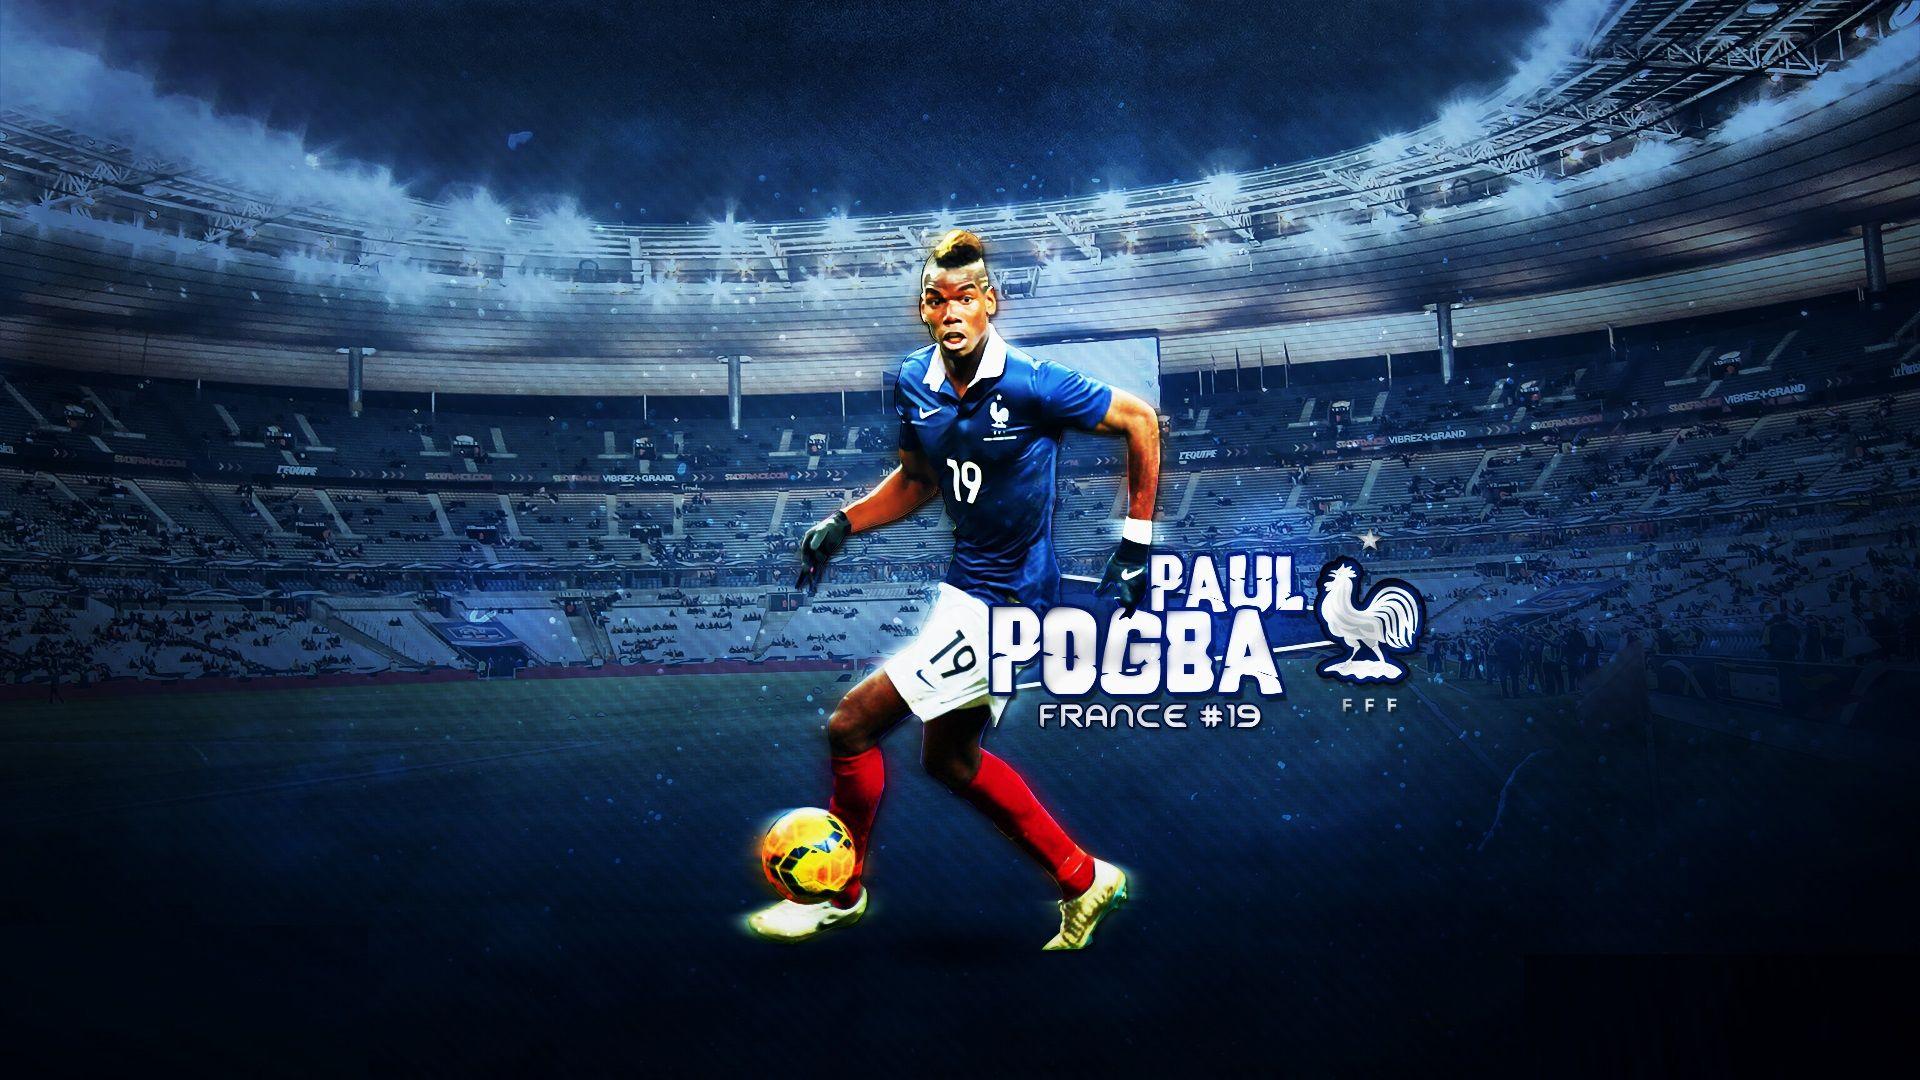 Paul Pogba Hd Wallpapers Paul Pogba Pogba France Paul